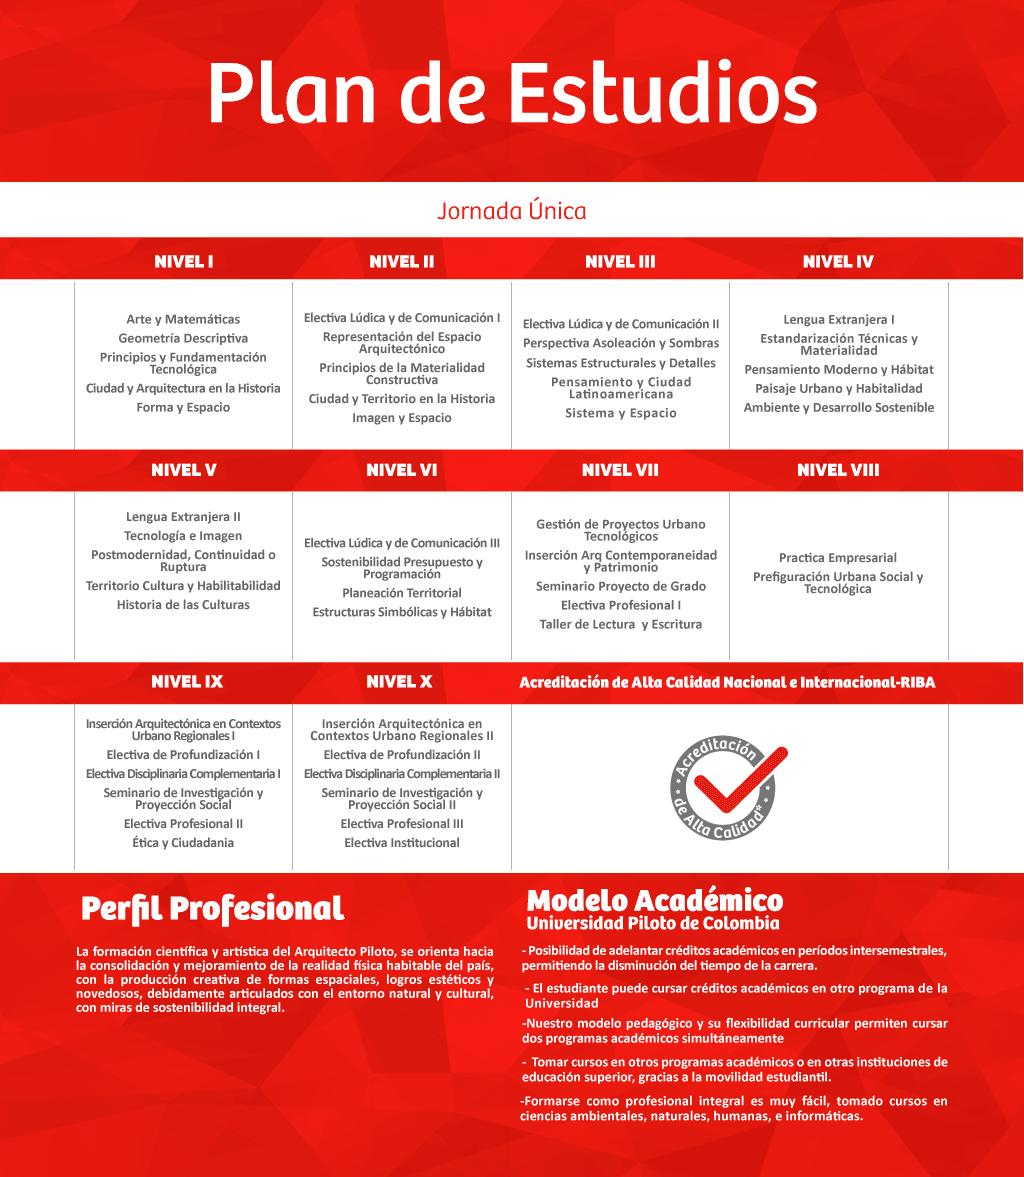 universidad piloto de colombia arquitectura